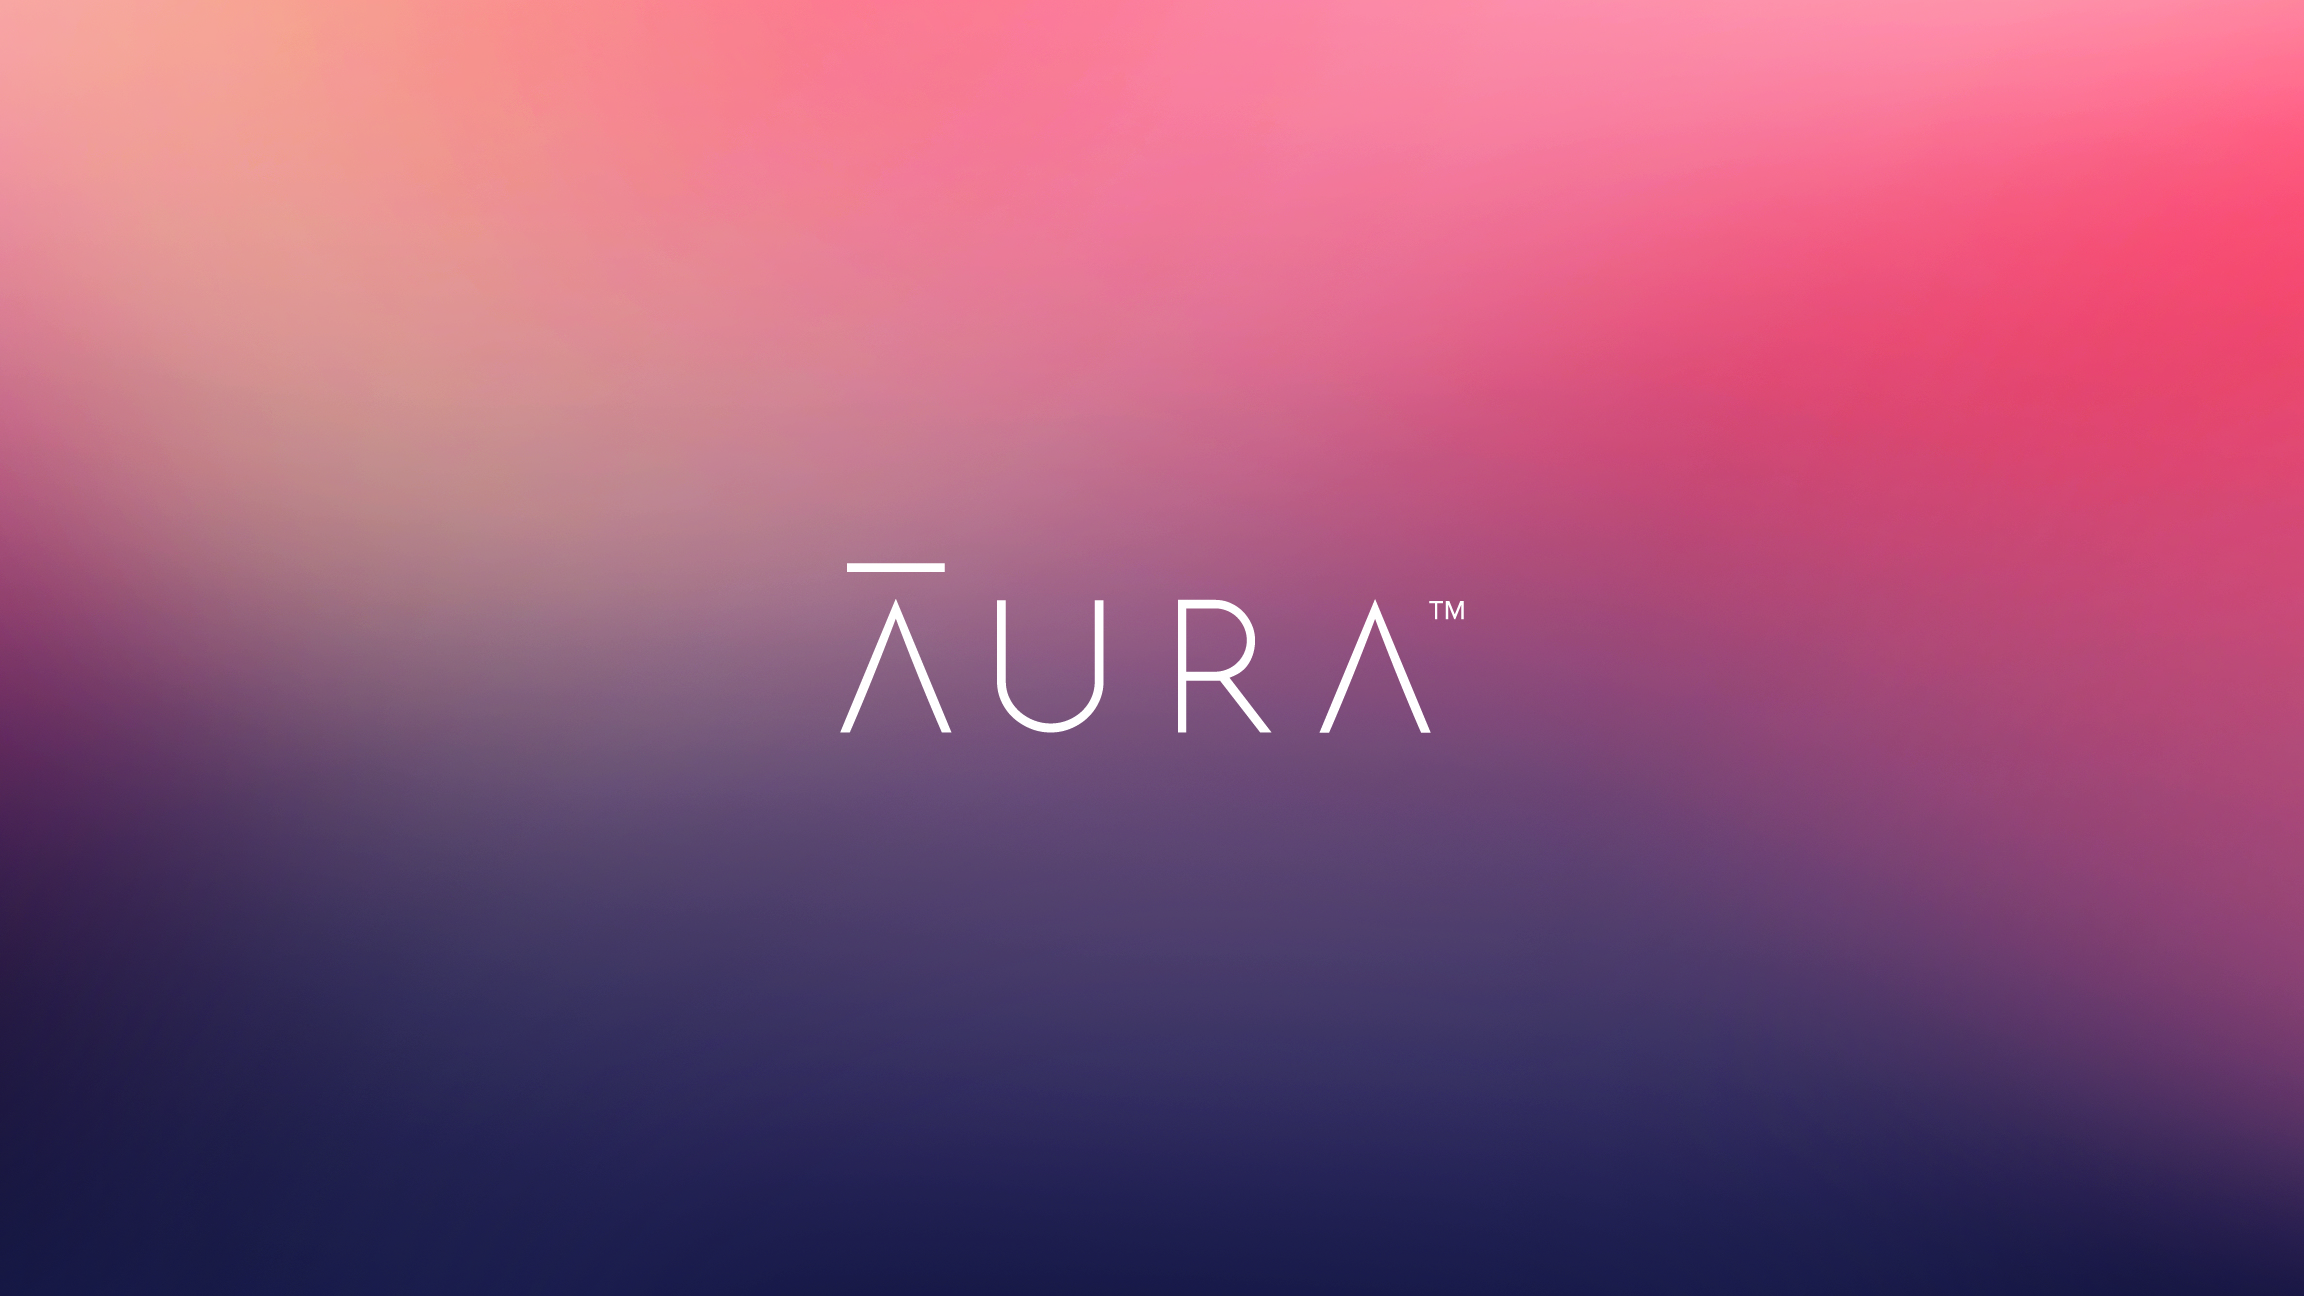 190816_Aura3